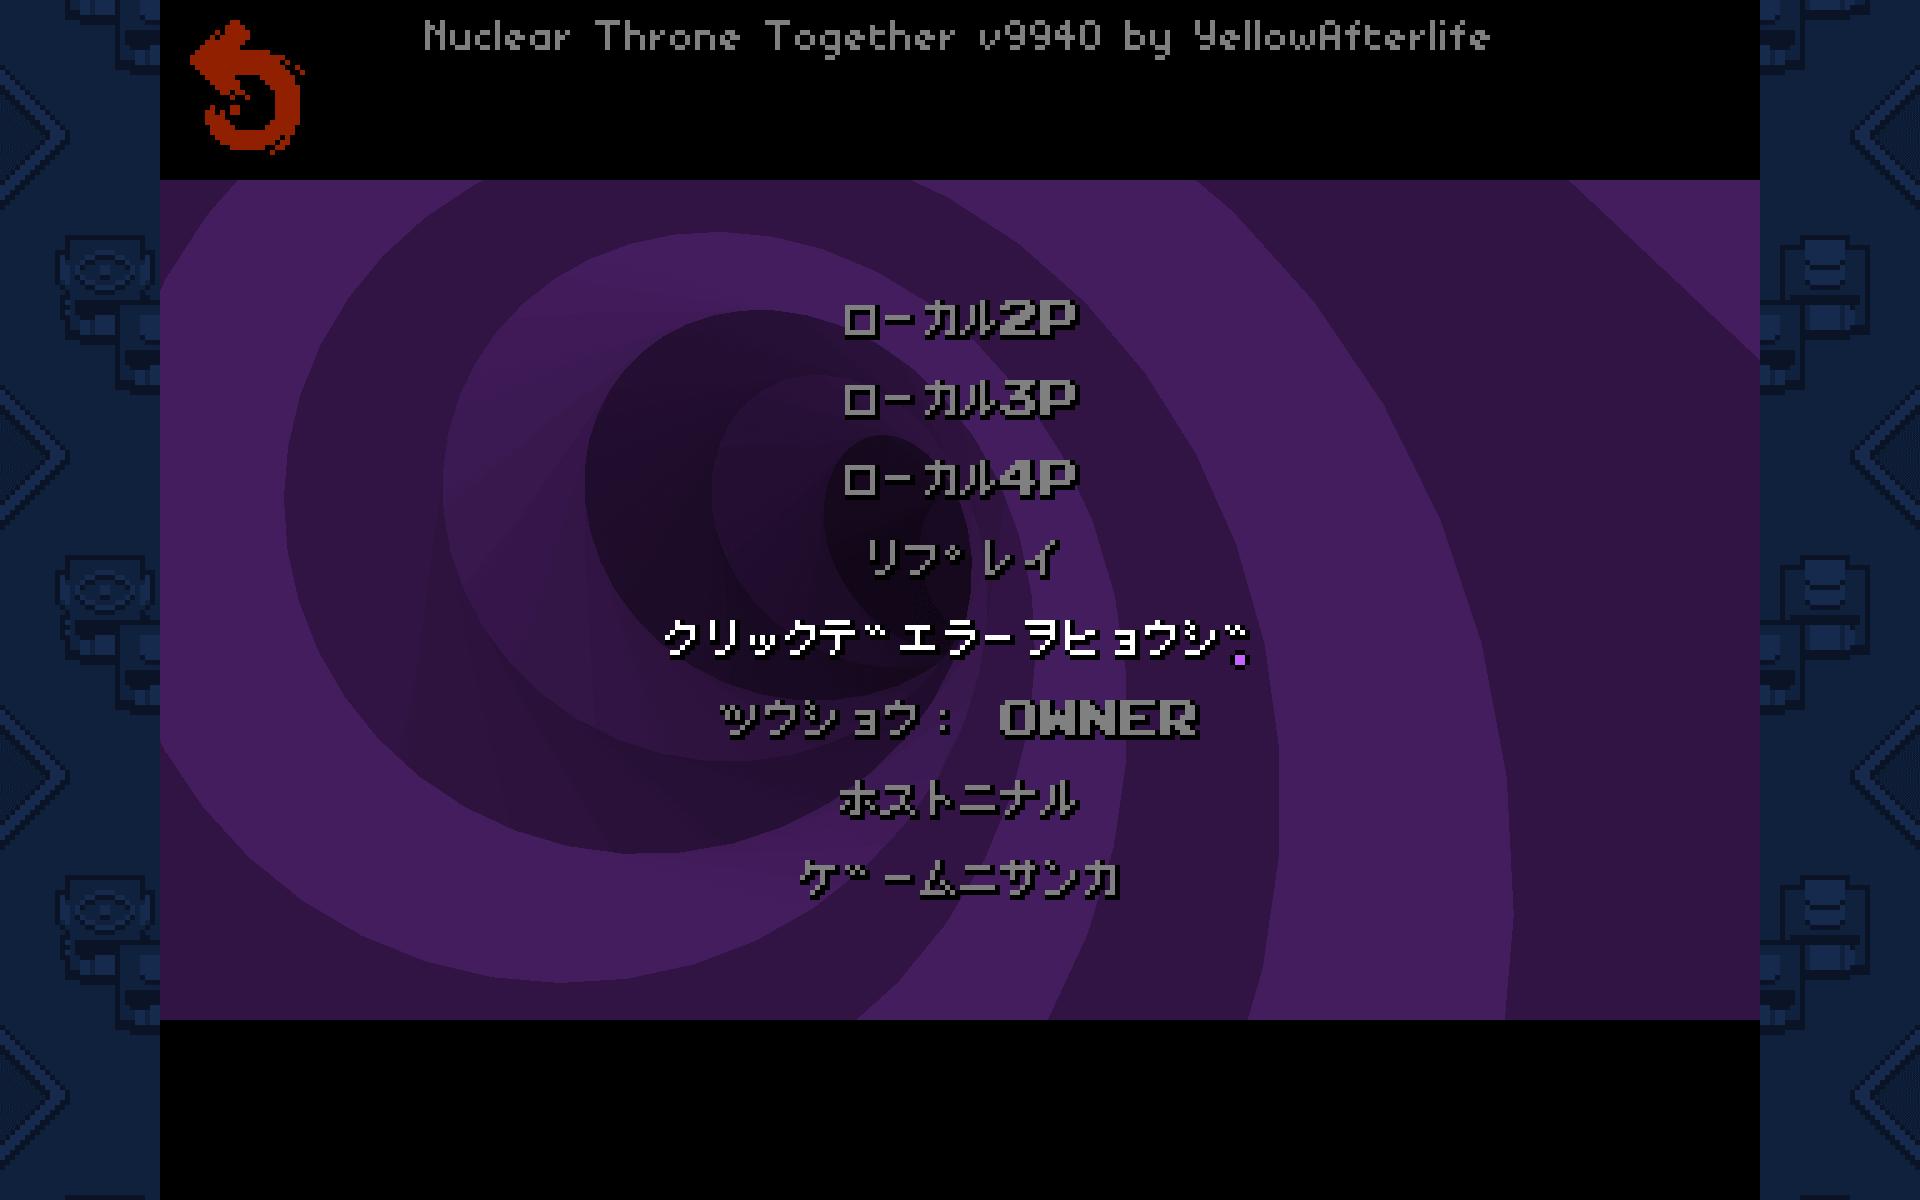 PC ゲーム Nuclear Throne 日本語化とゲームプレイ最適化メモ、Nuclear Throne Together (NTT) Epic 版導入時の注意、マルチプレイオプション Steam 使用不可、Steam マルチエラー USE STEAM N/A